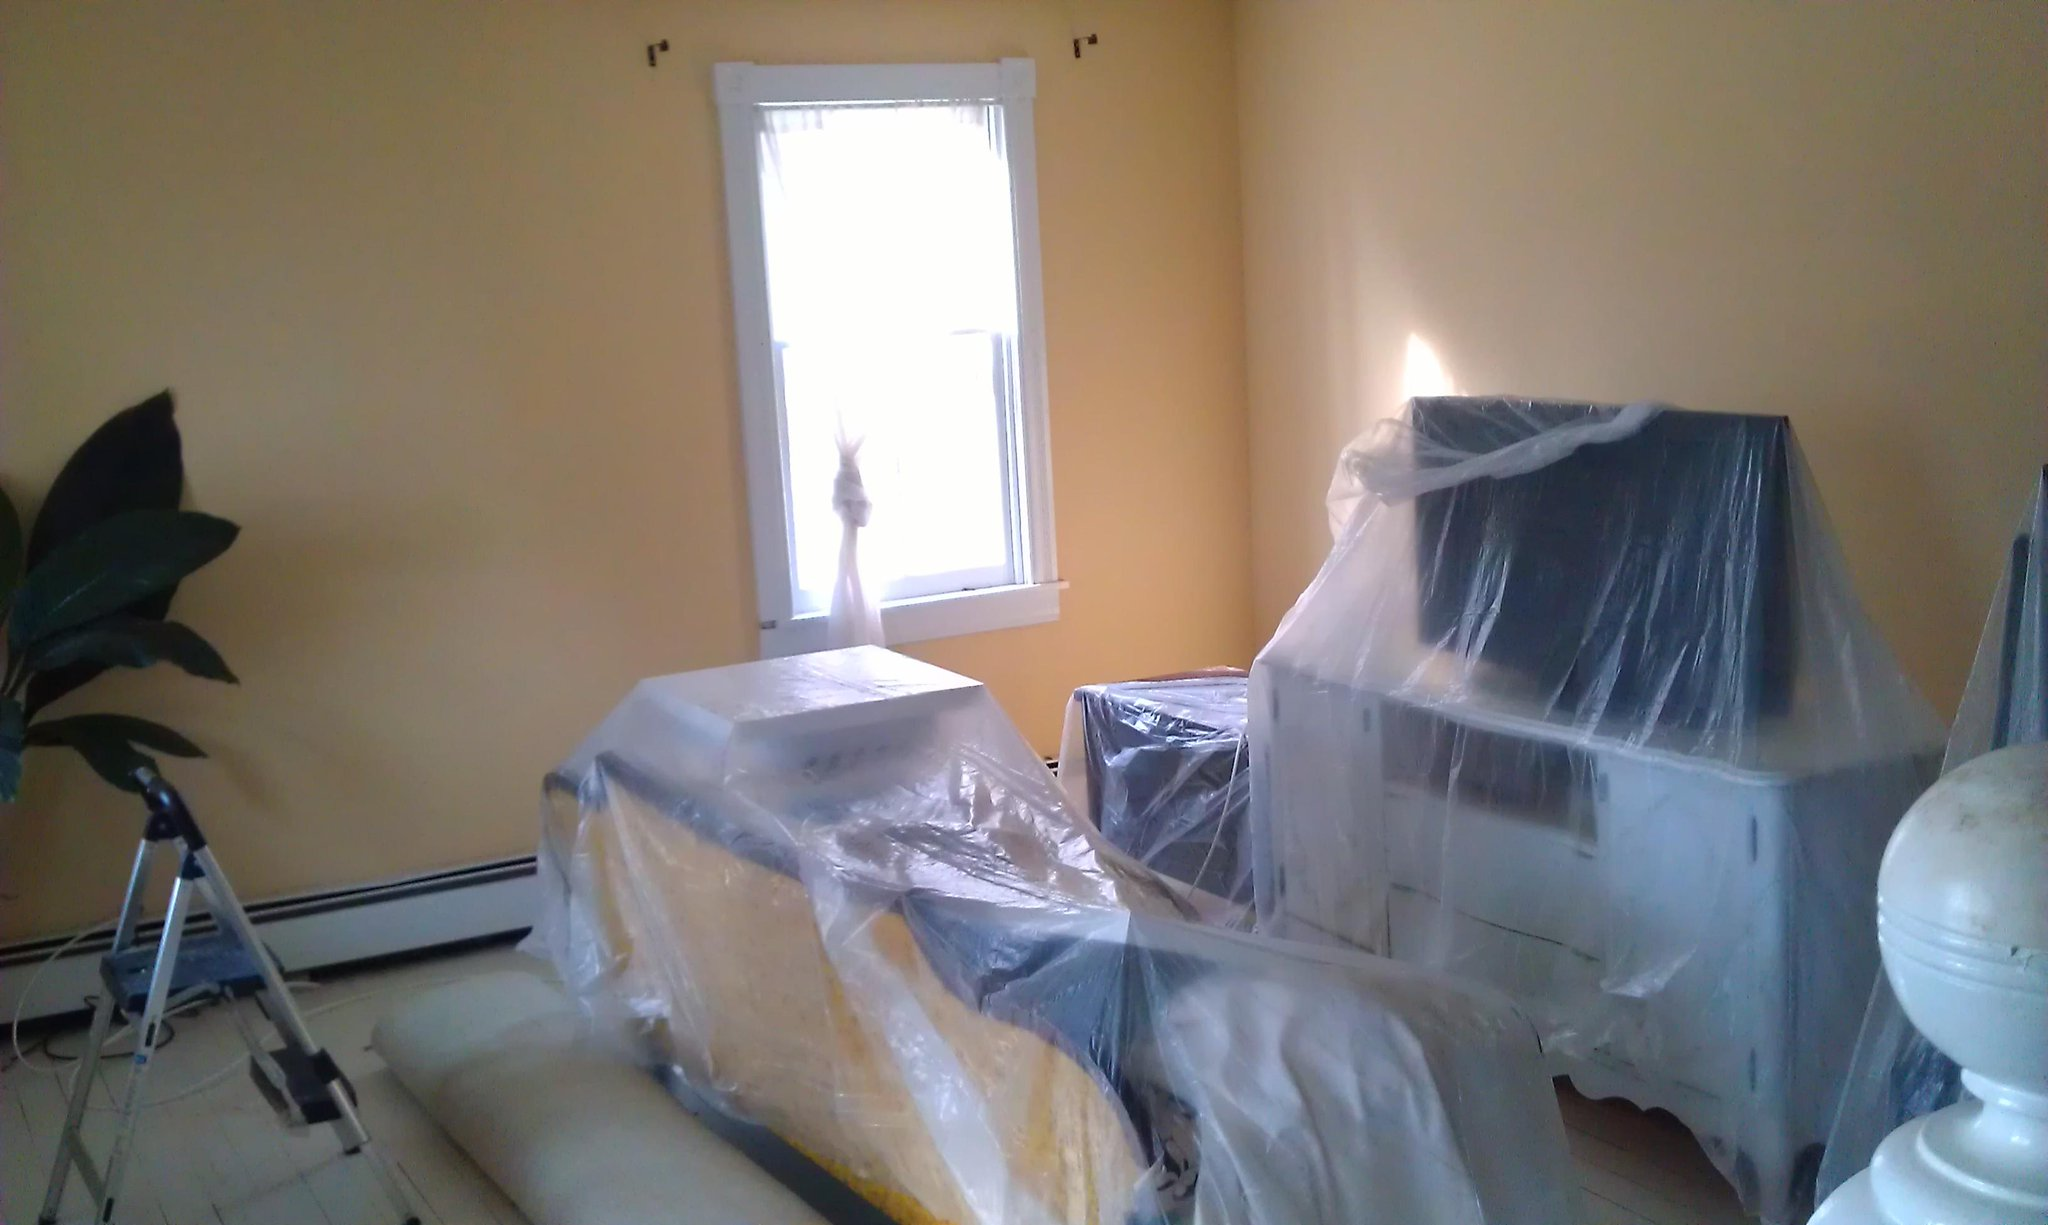 Living room in progress